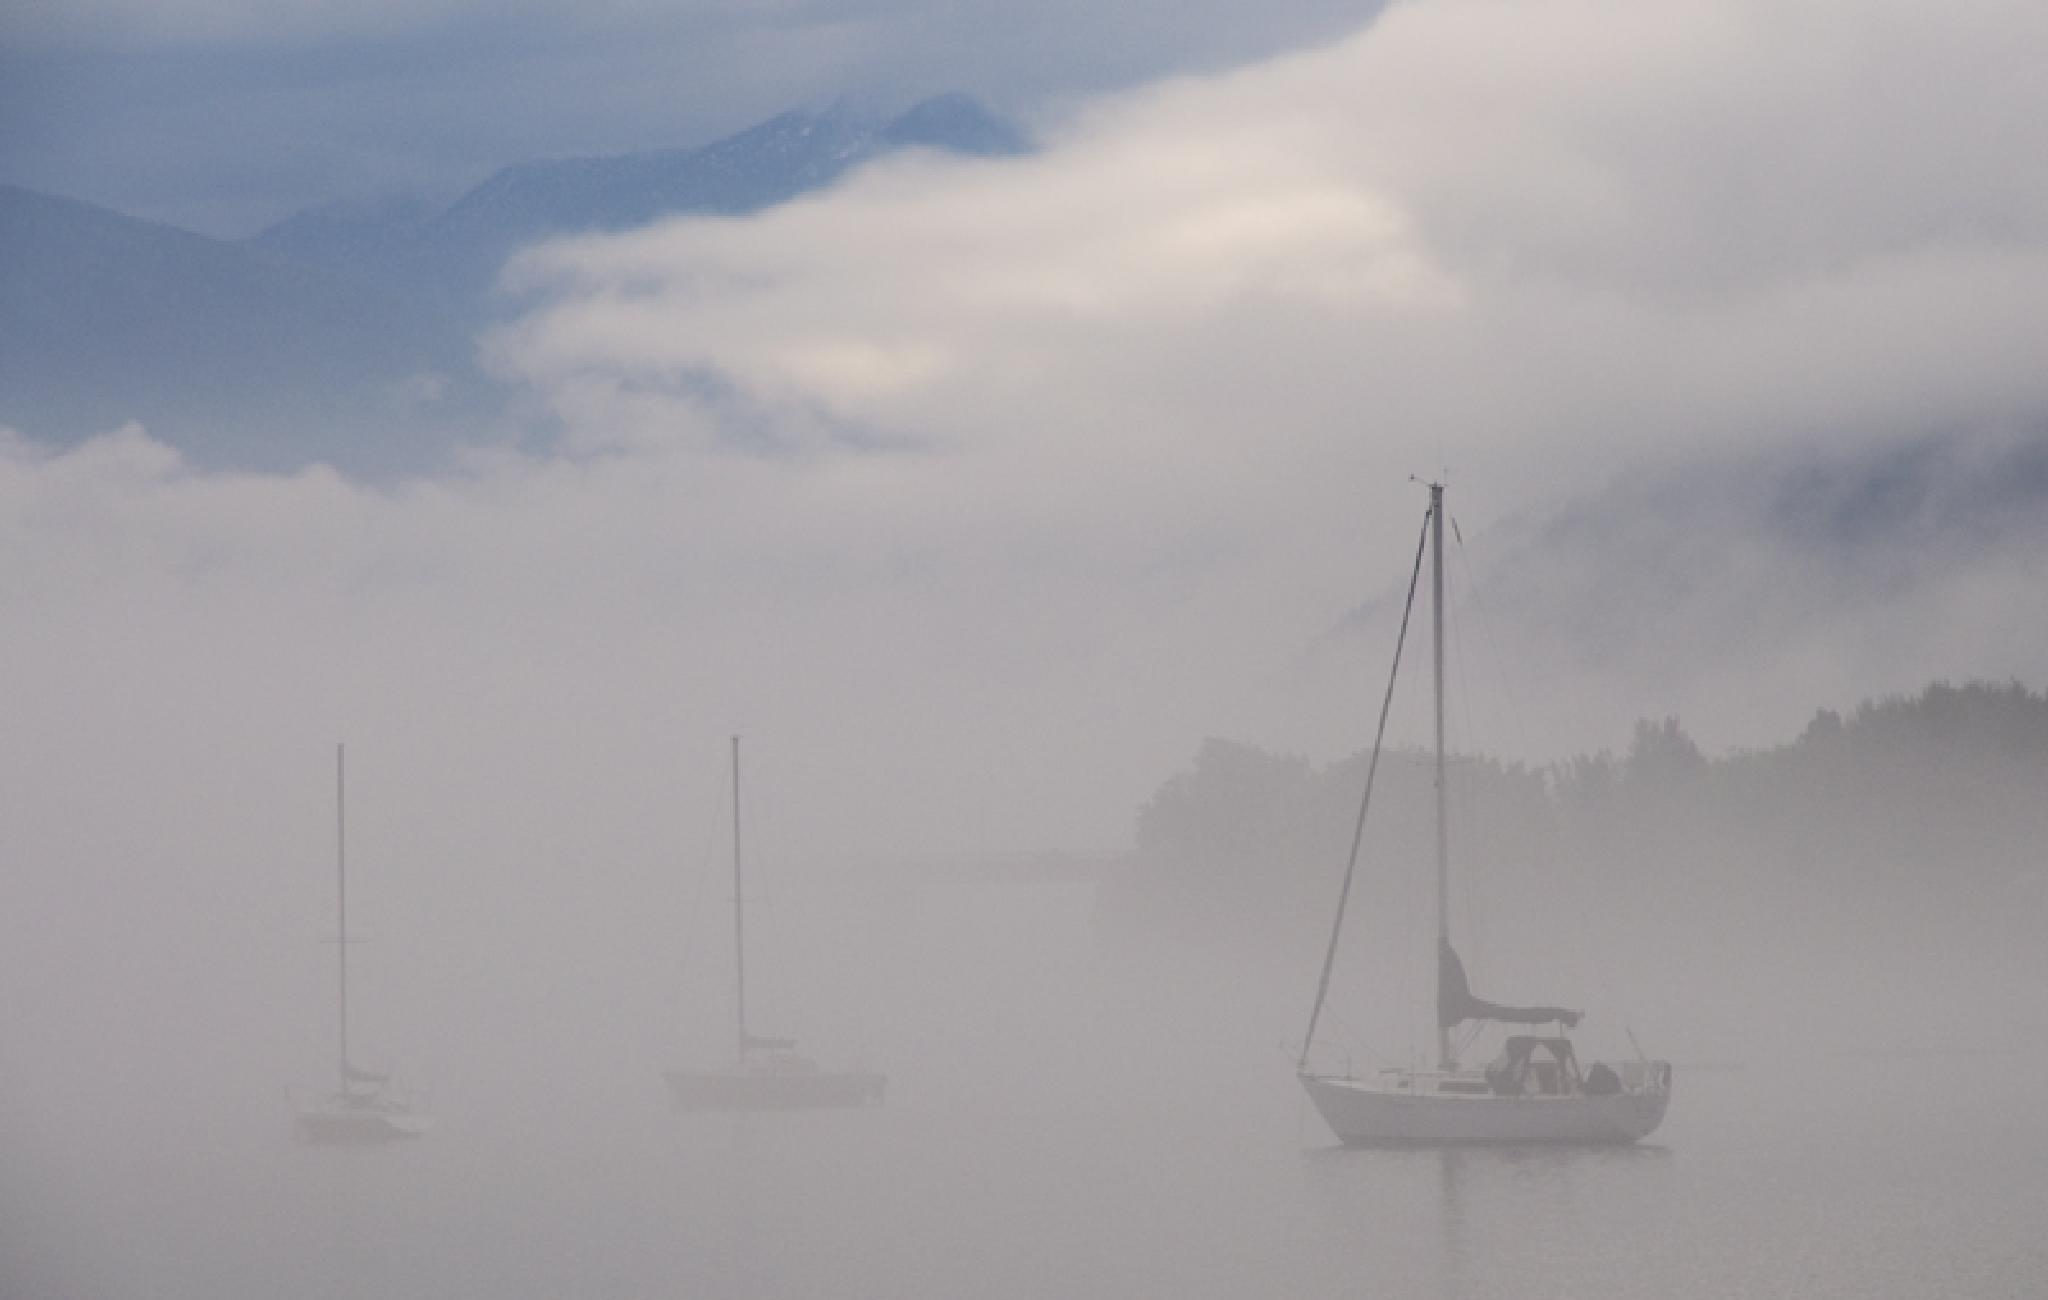 Boats in fog by MadeleineGuenette